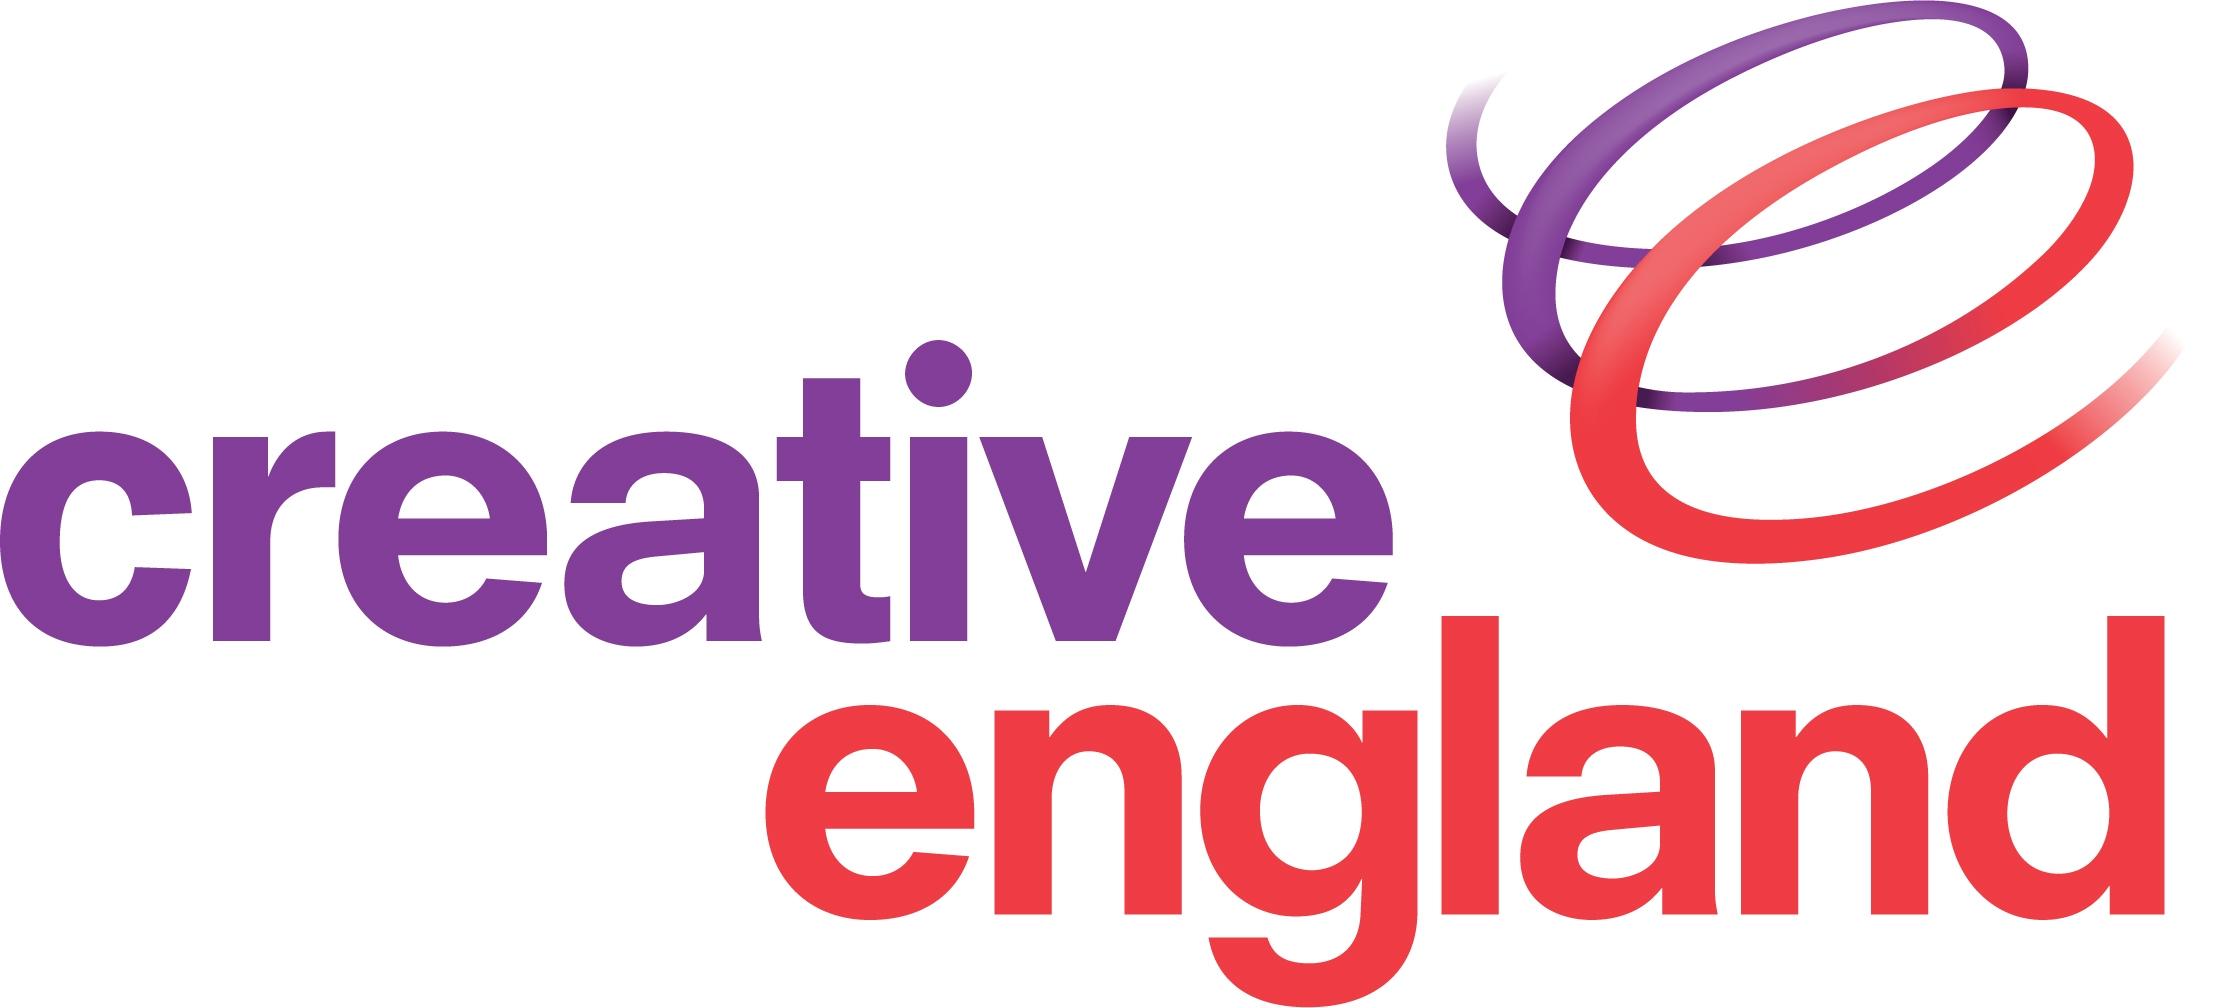 Creative-England-new-logo-2_0.jpg